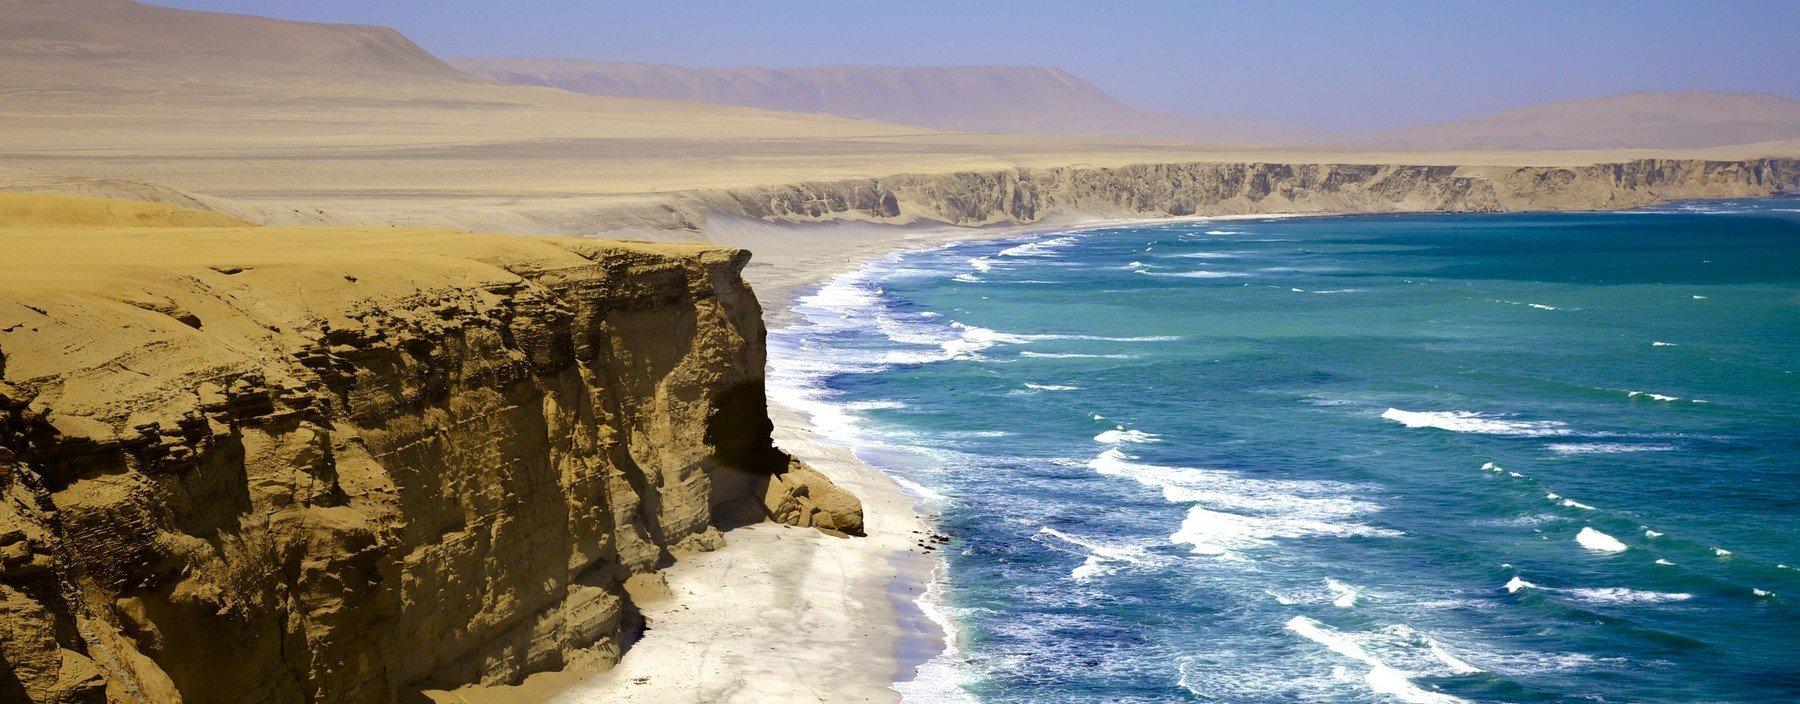 pe, paracas, ballestas eilanden (3).jpg